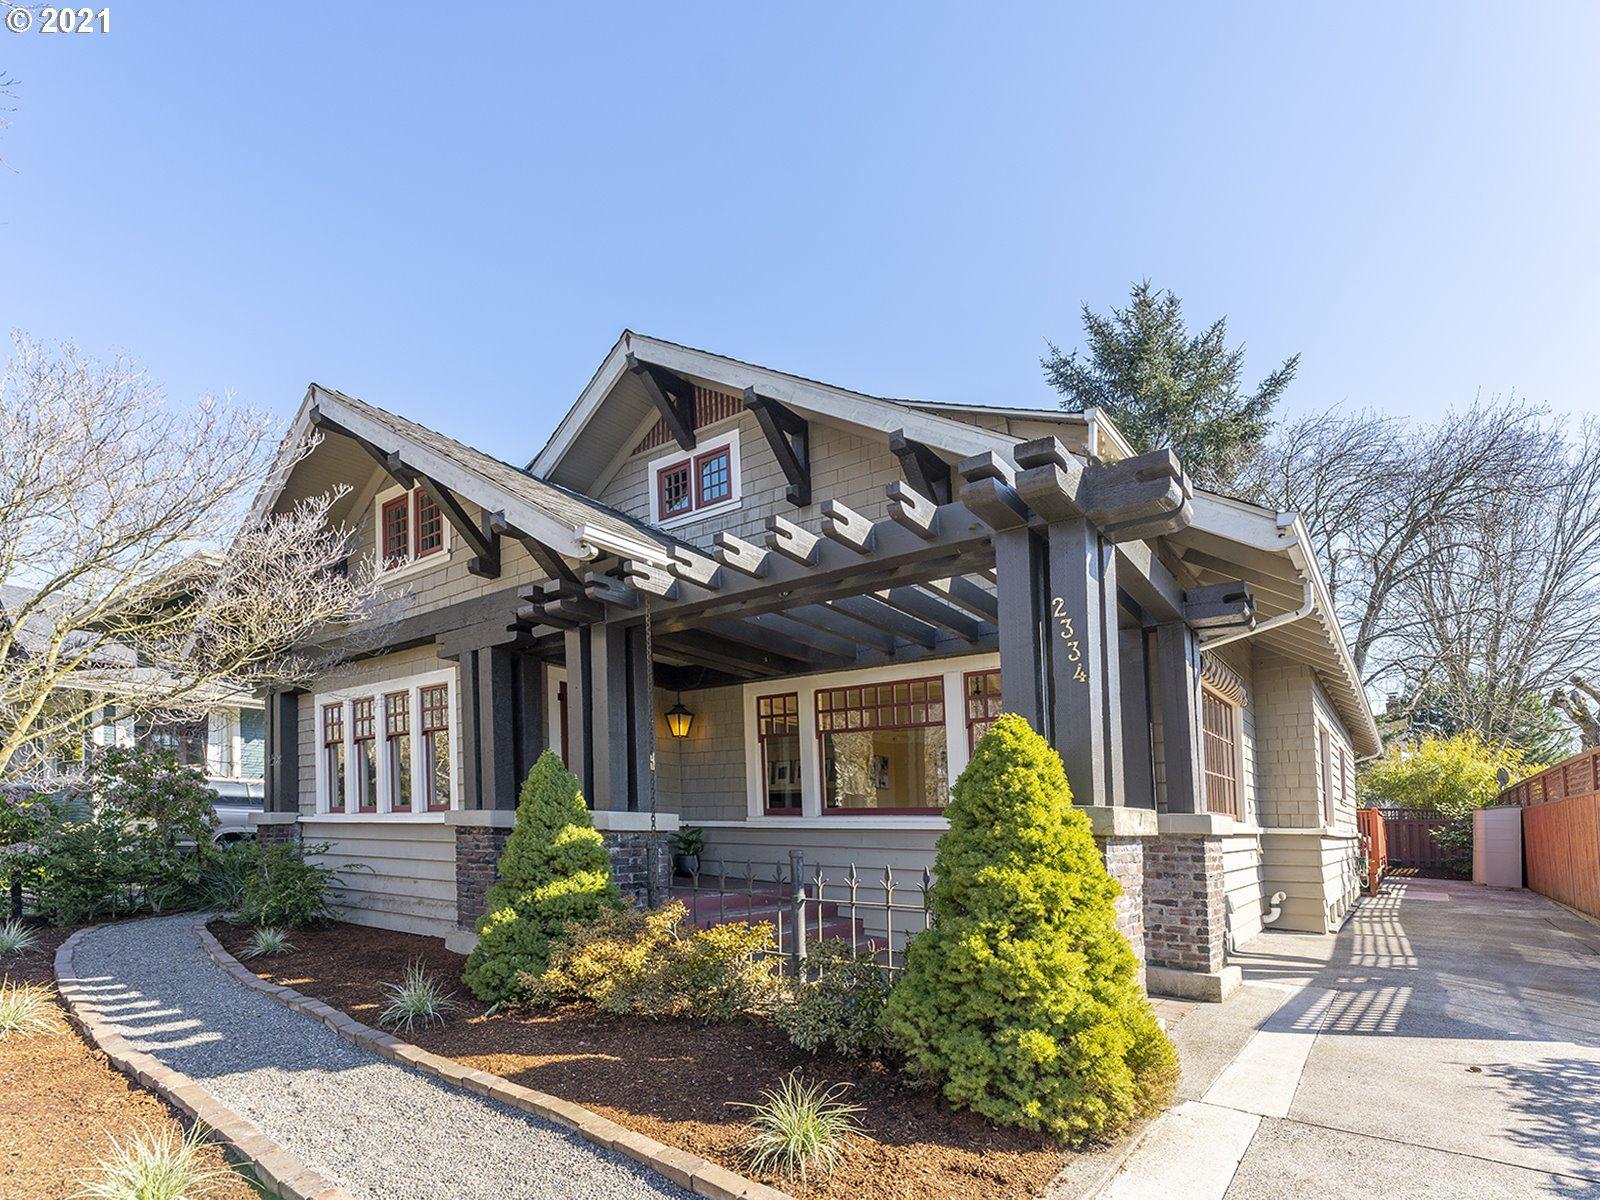 2334 NE 47TH AVE, Portland, OR 97213 - MLS#: 21683718